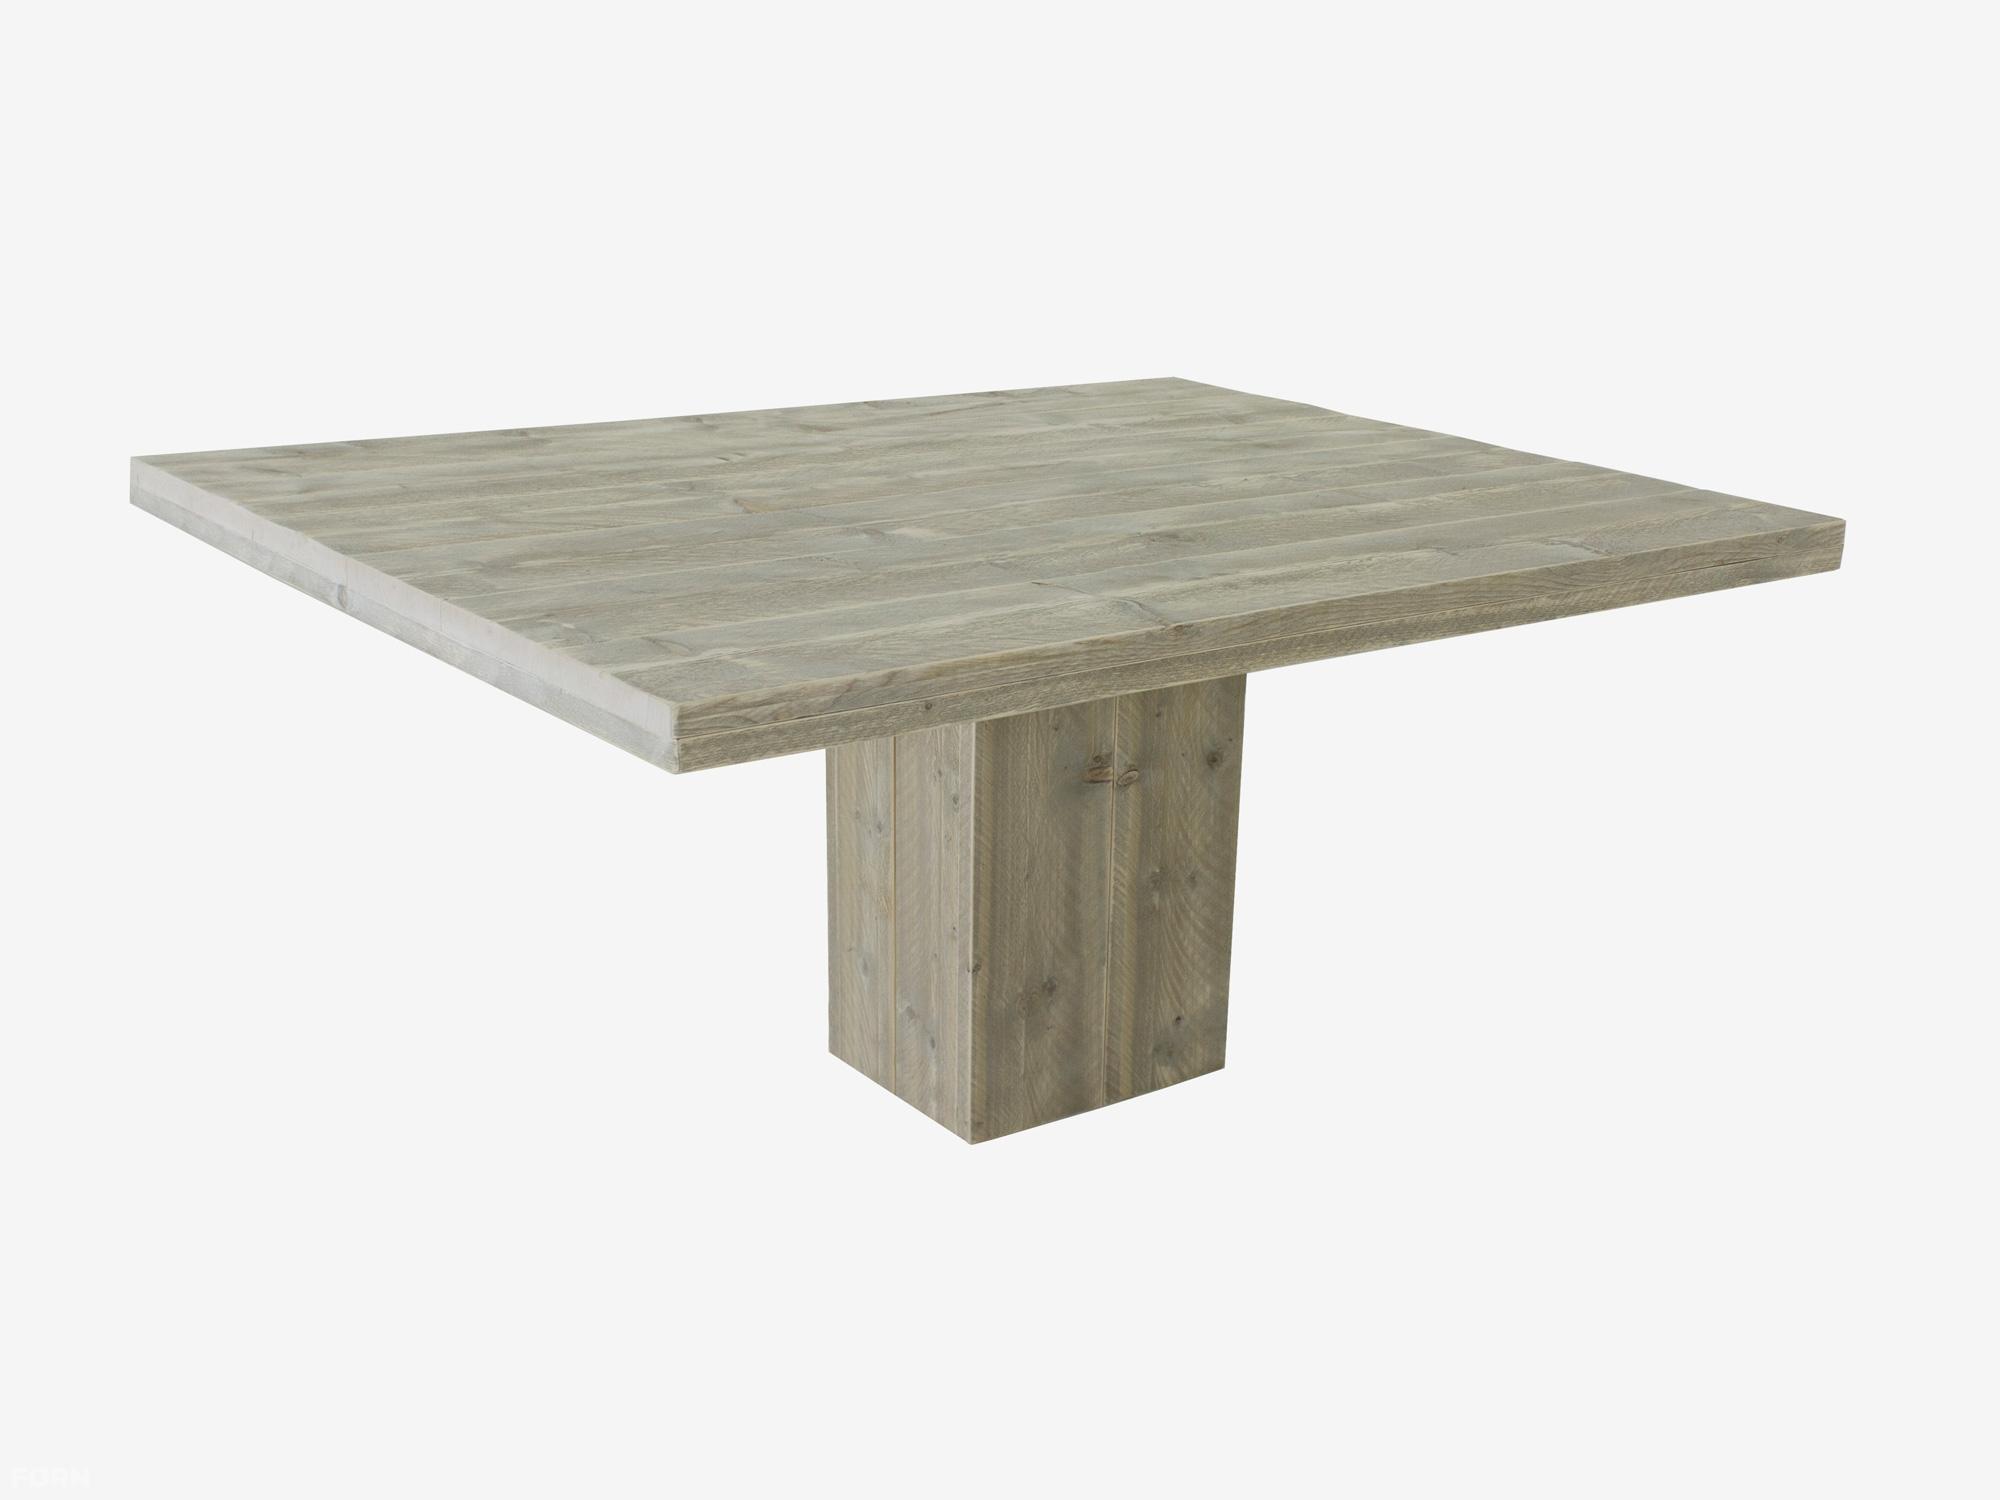 Steigerhout tafel maken bouwtekening steigerhout kolompoot tafel steigerhout bouwpakket - Tafel met chevet ...